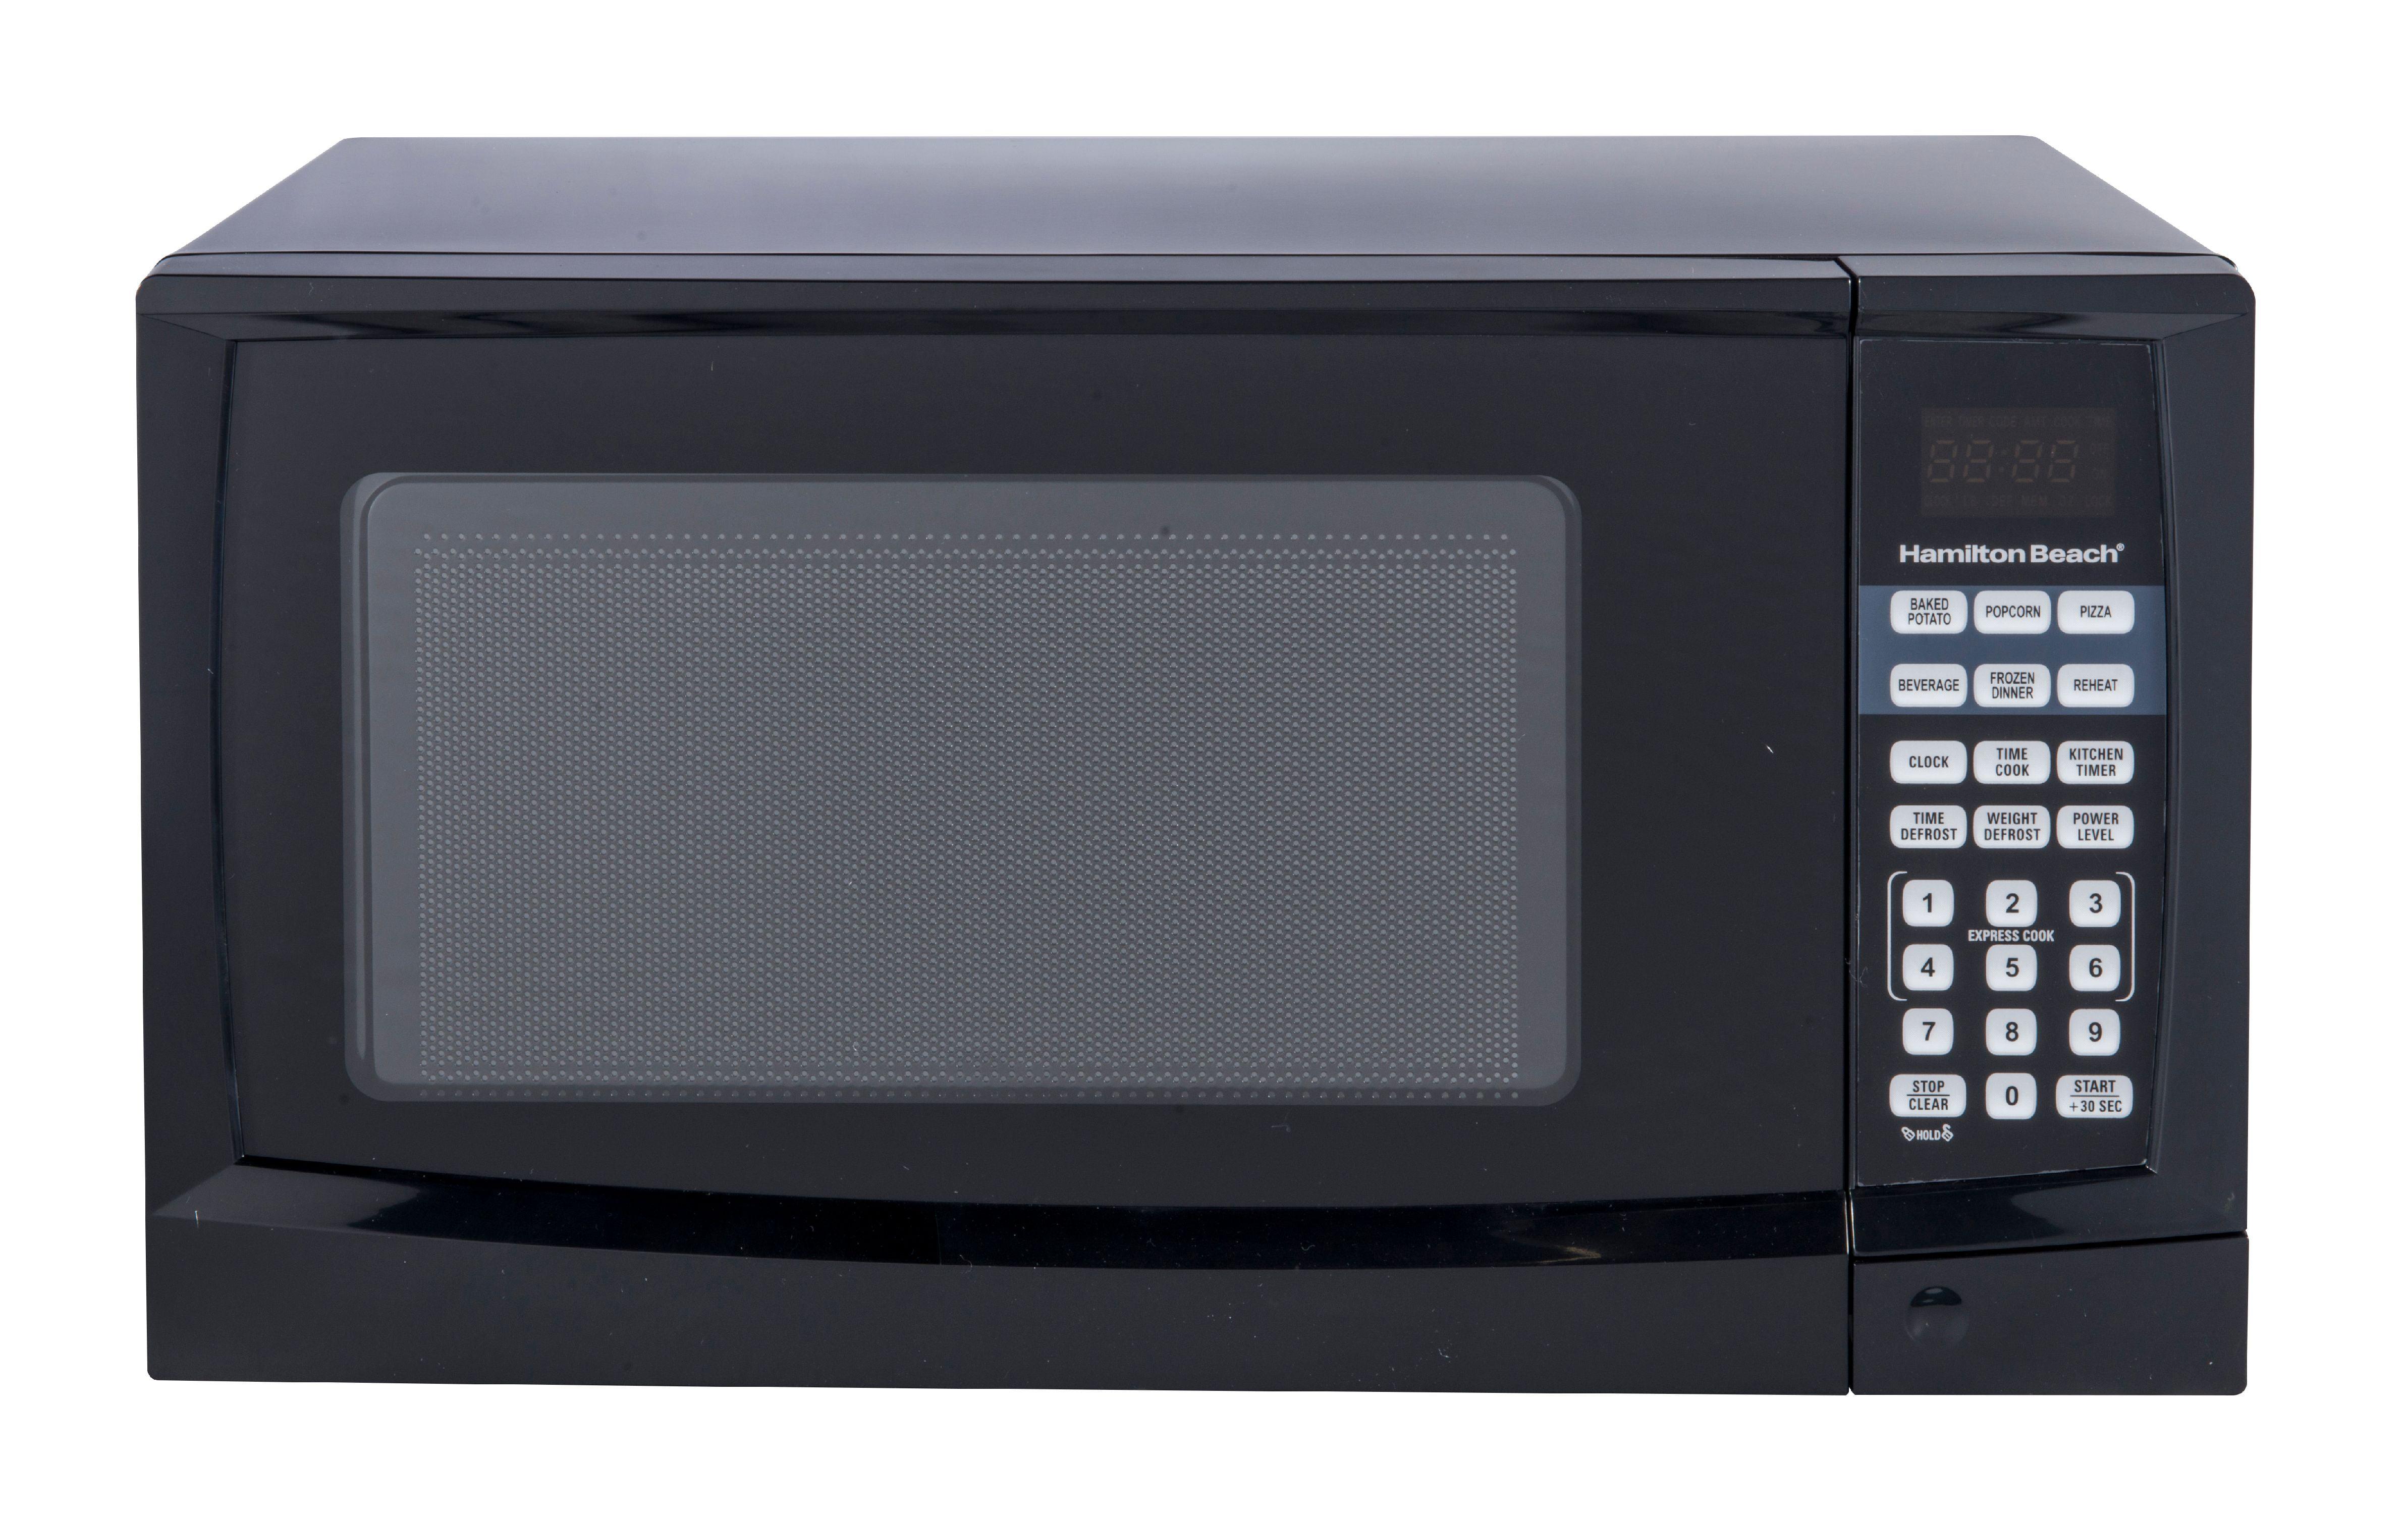 hamilton beach 0 9 cu ft digital microwave black walmart com rh walmart com